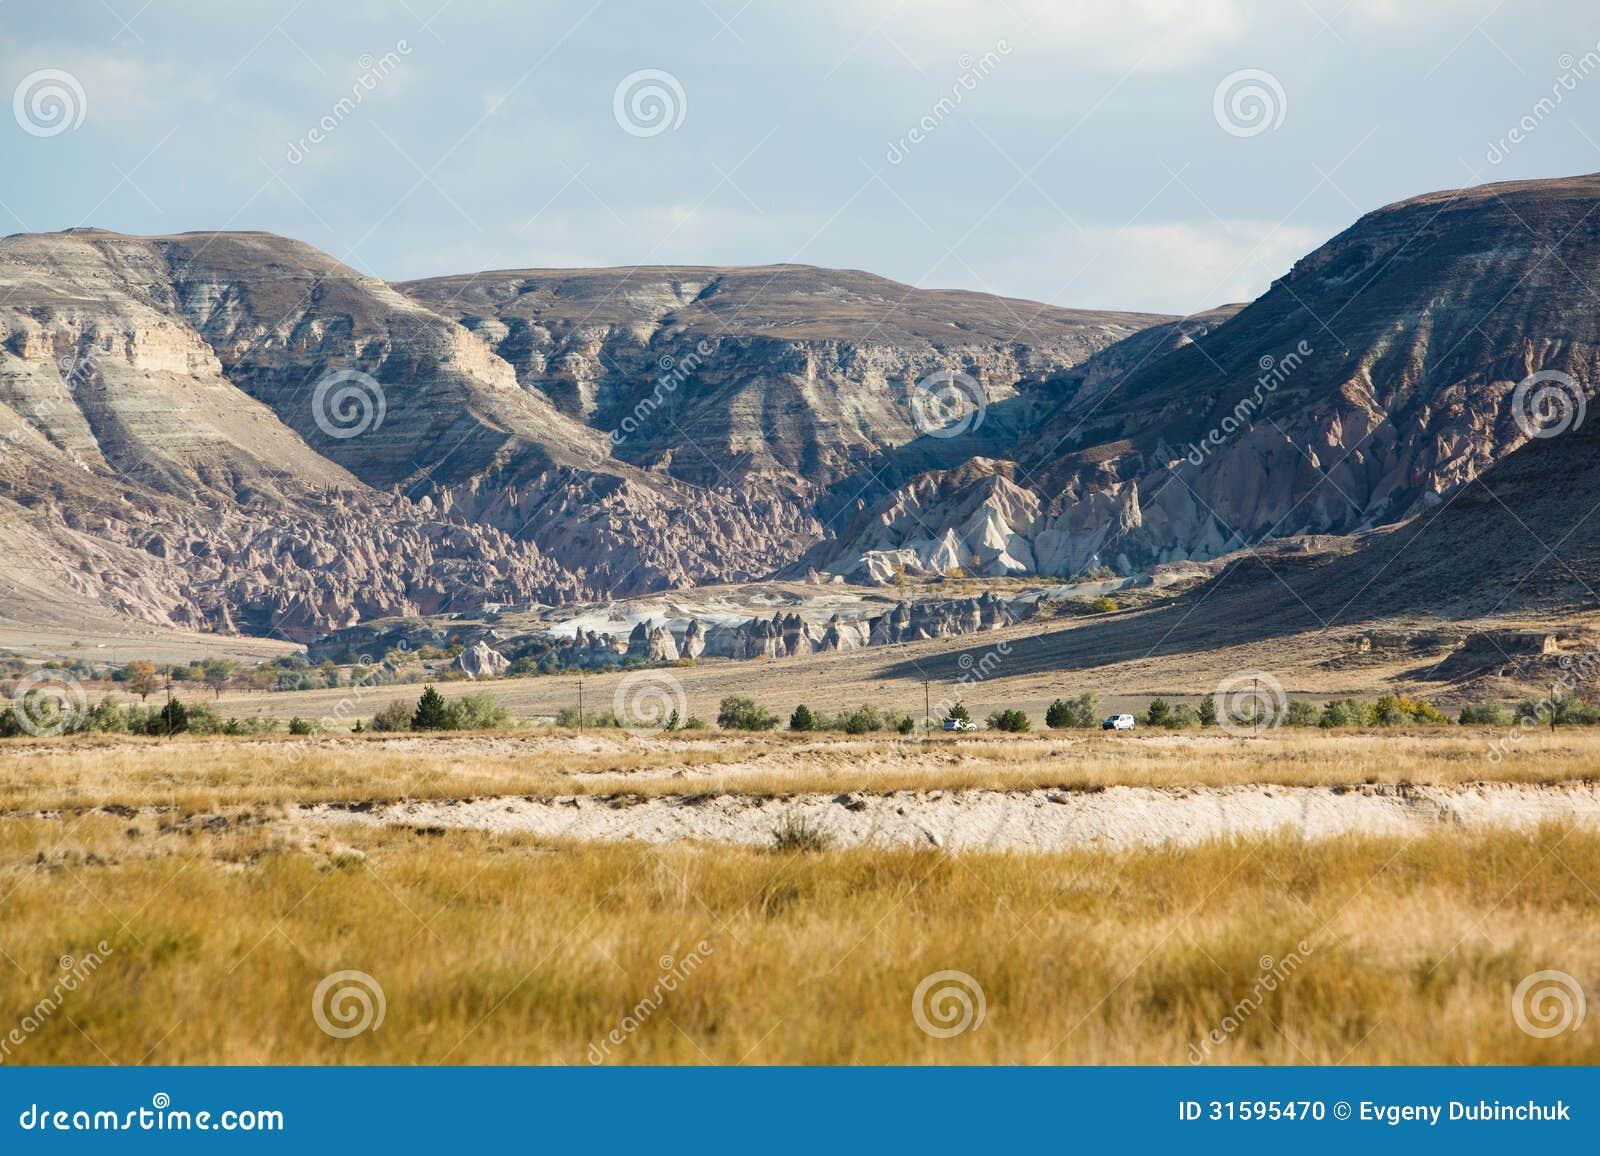 Best Time To Travel To Cappadocia Turkey